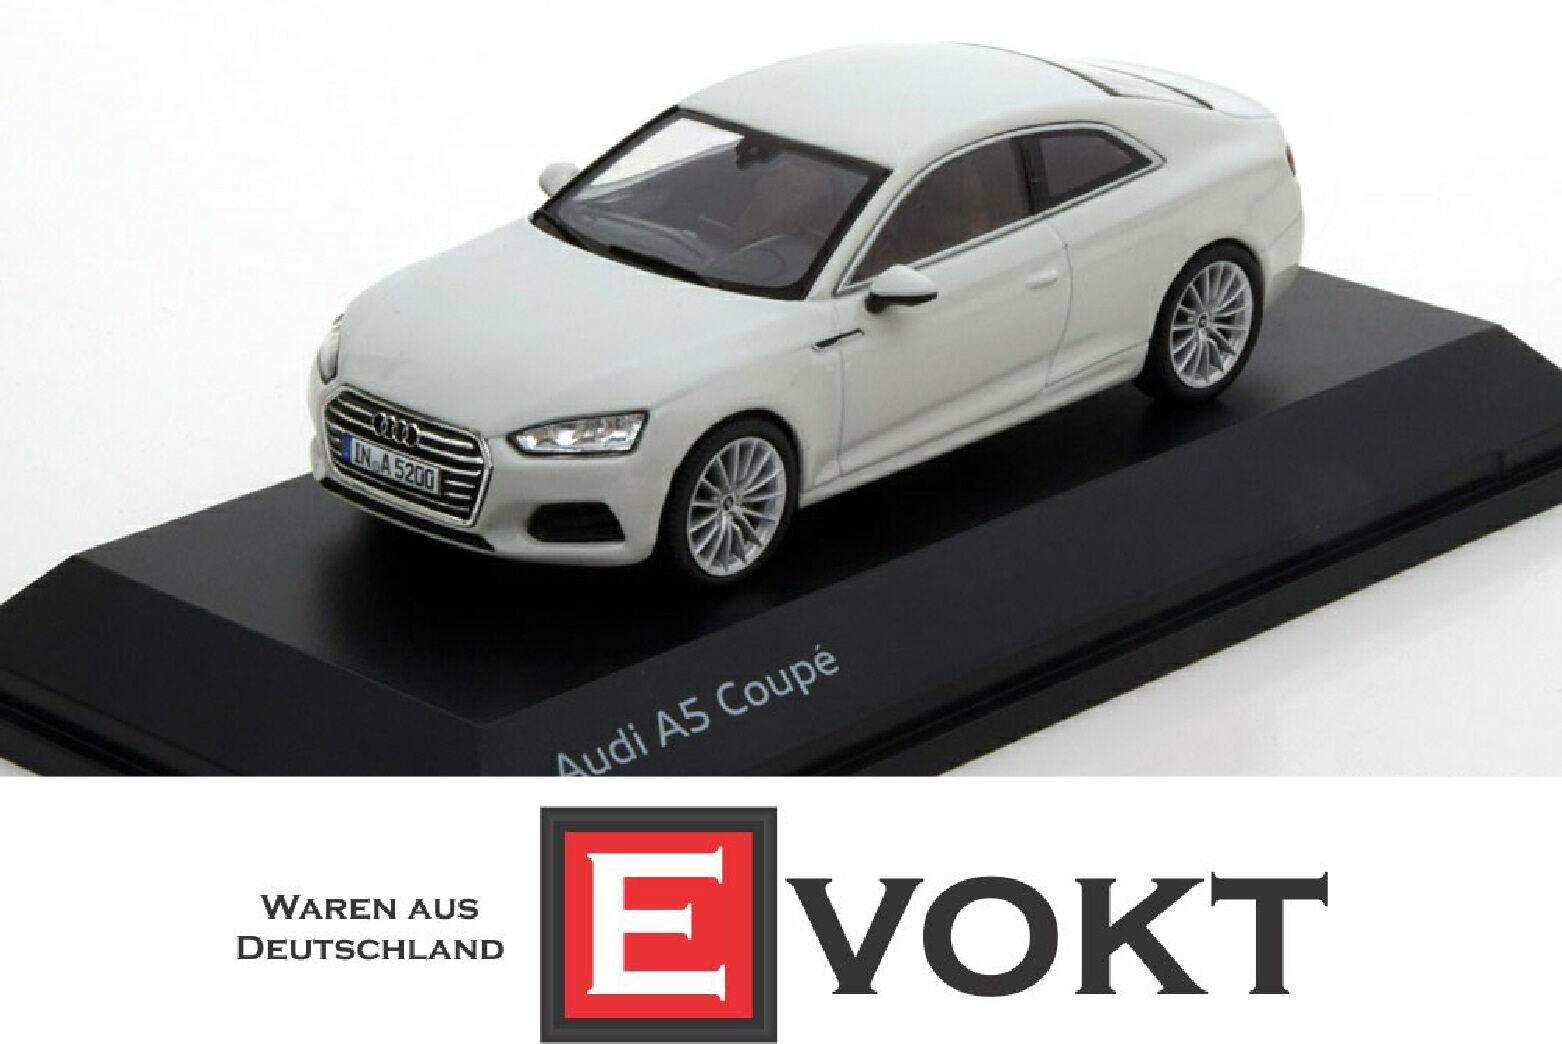 Original Audi A5 Coupe Coche Modelo 1 43 biancao Glaciar-biancao 5011605431